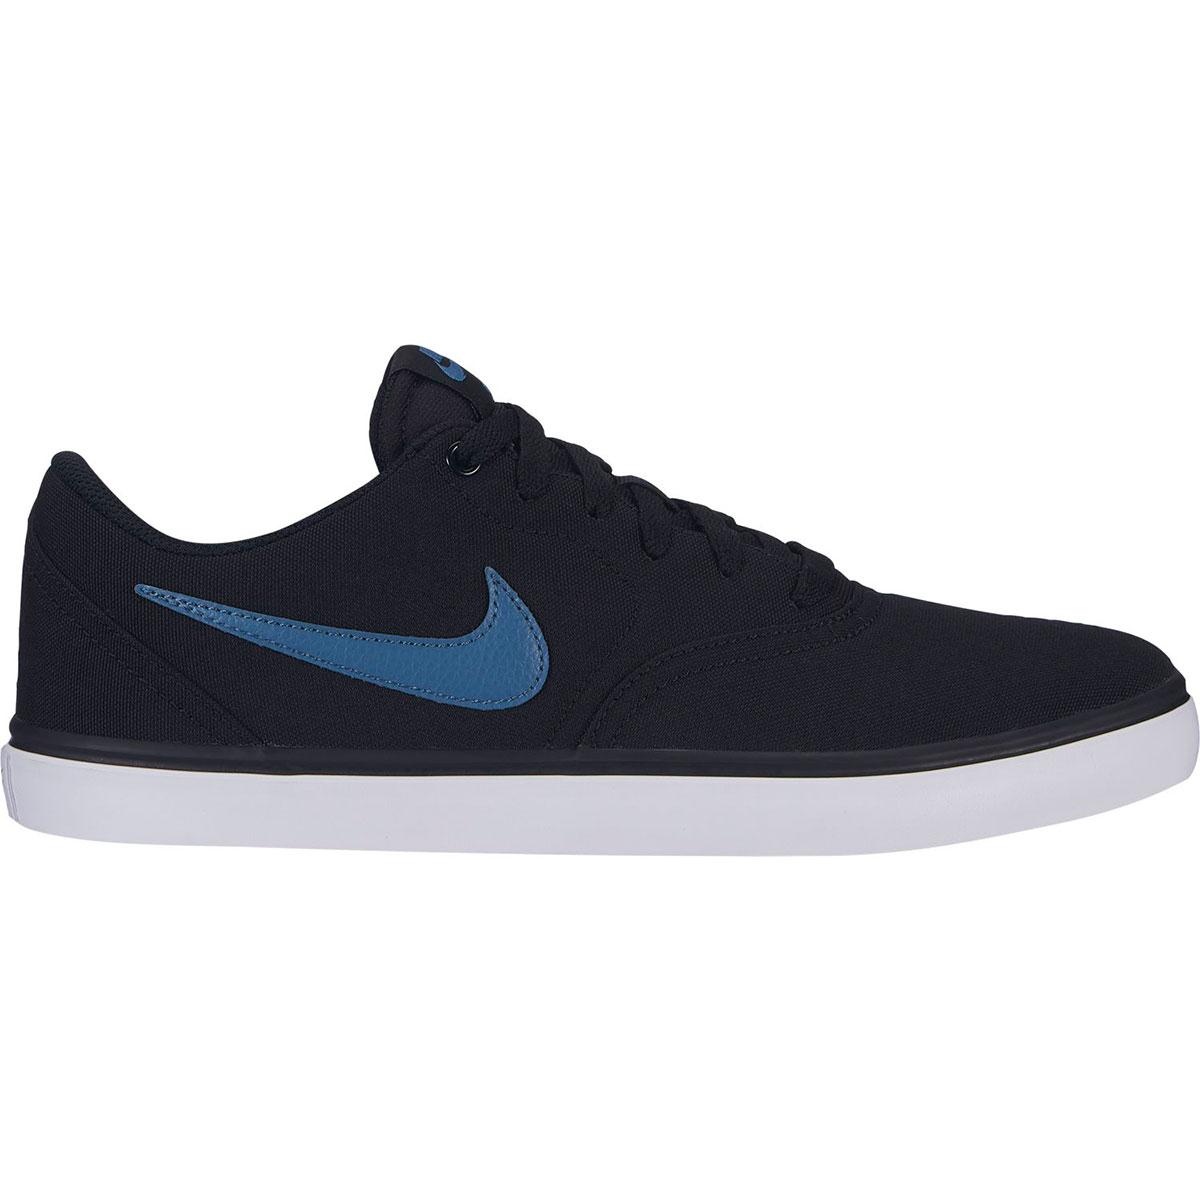 Nike Sb Men's Check Solar Canvas Skate Shoes - Black, 10